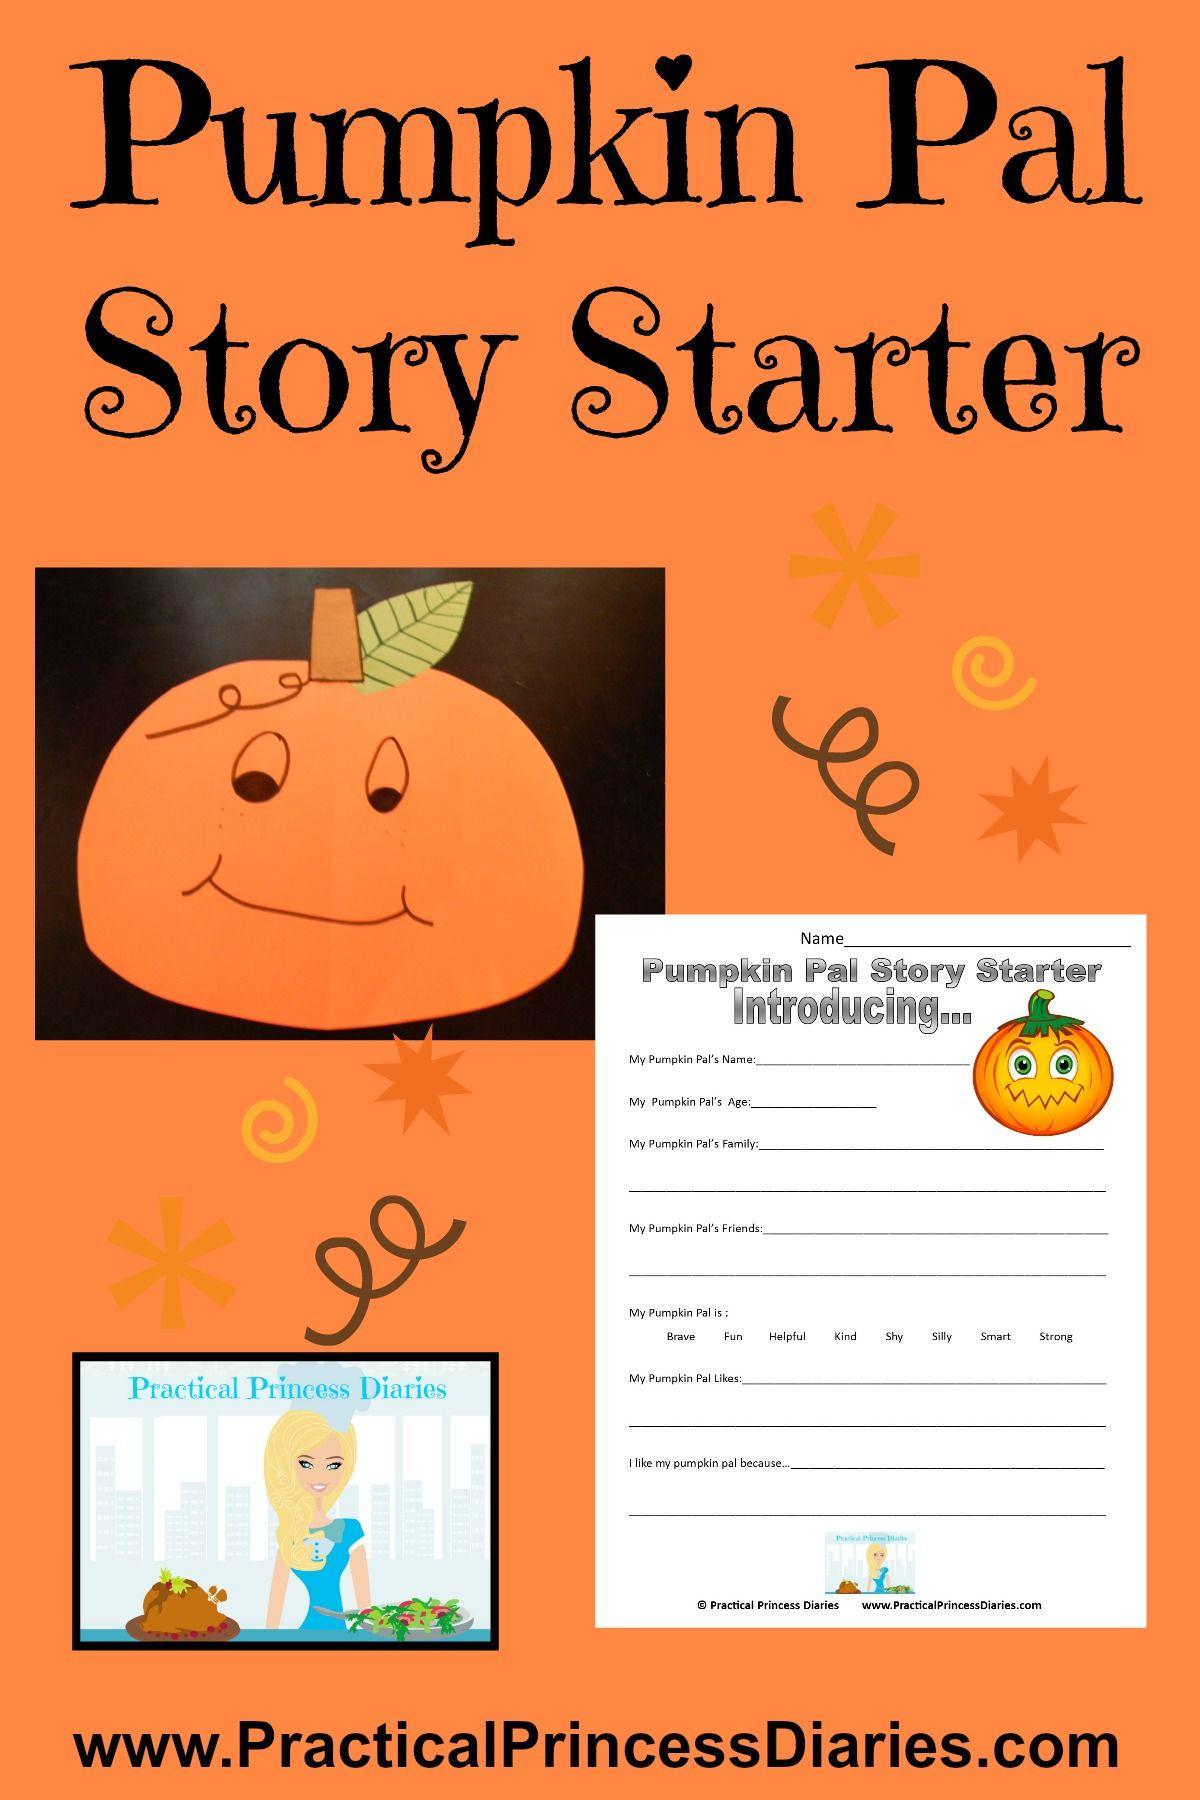 Practical Princess Diaries Pumpkin Pal Story Starter